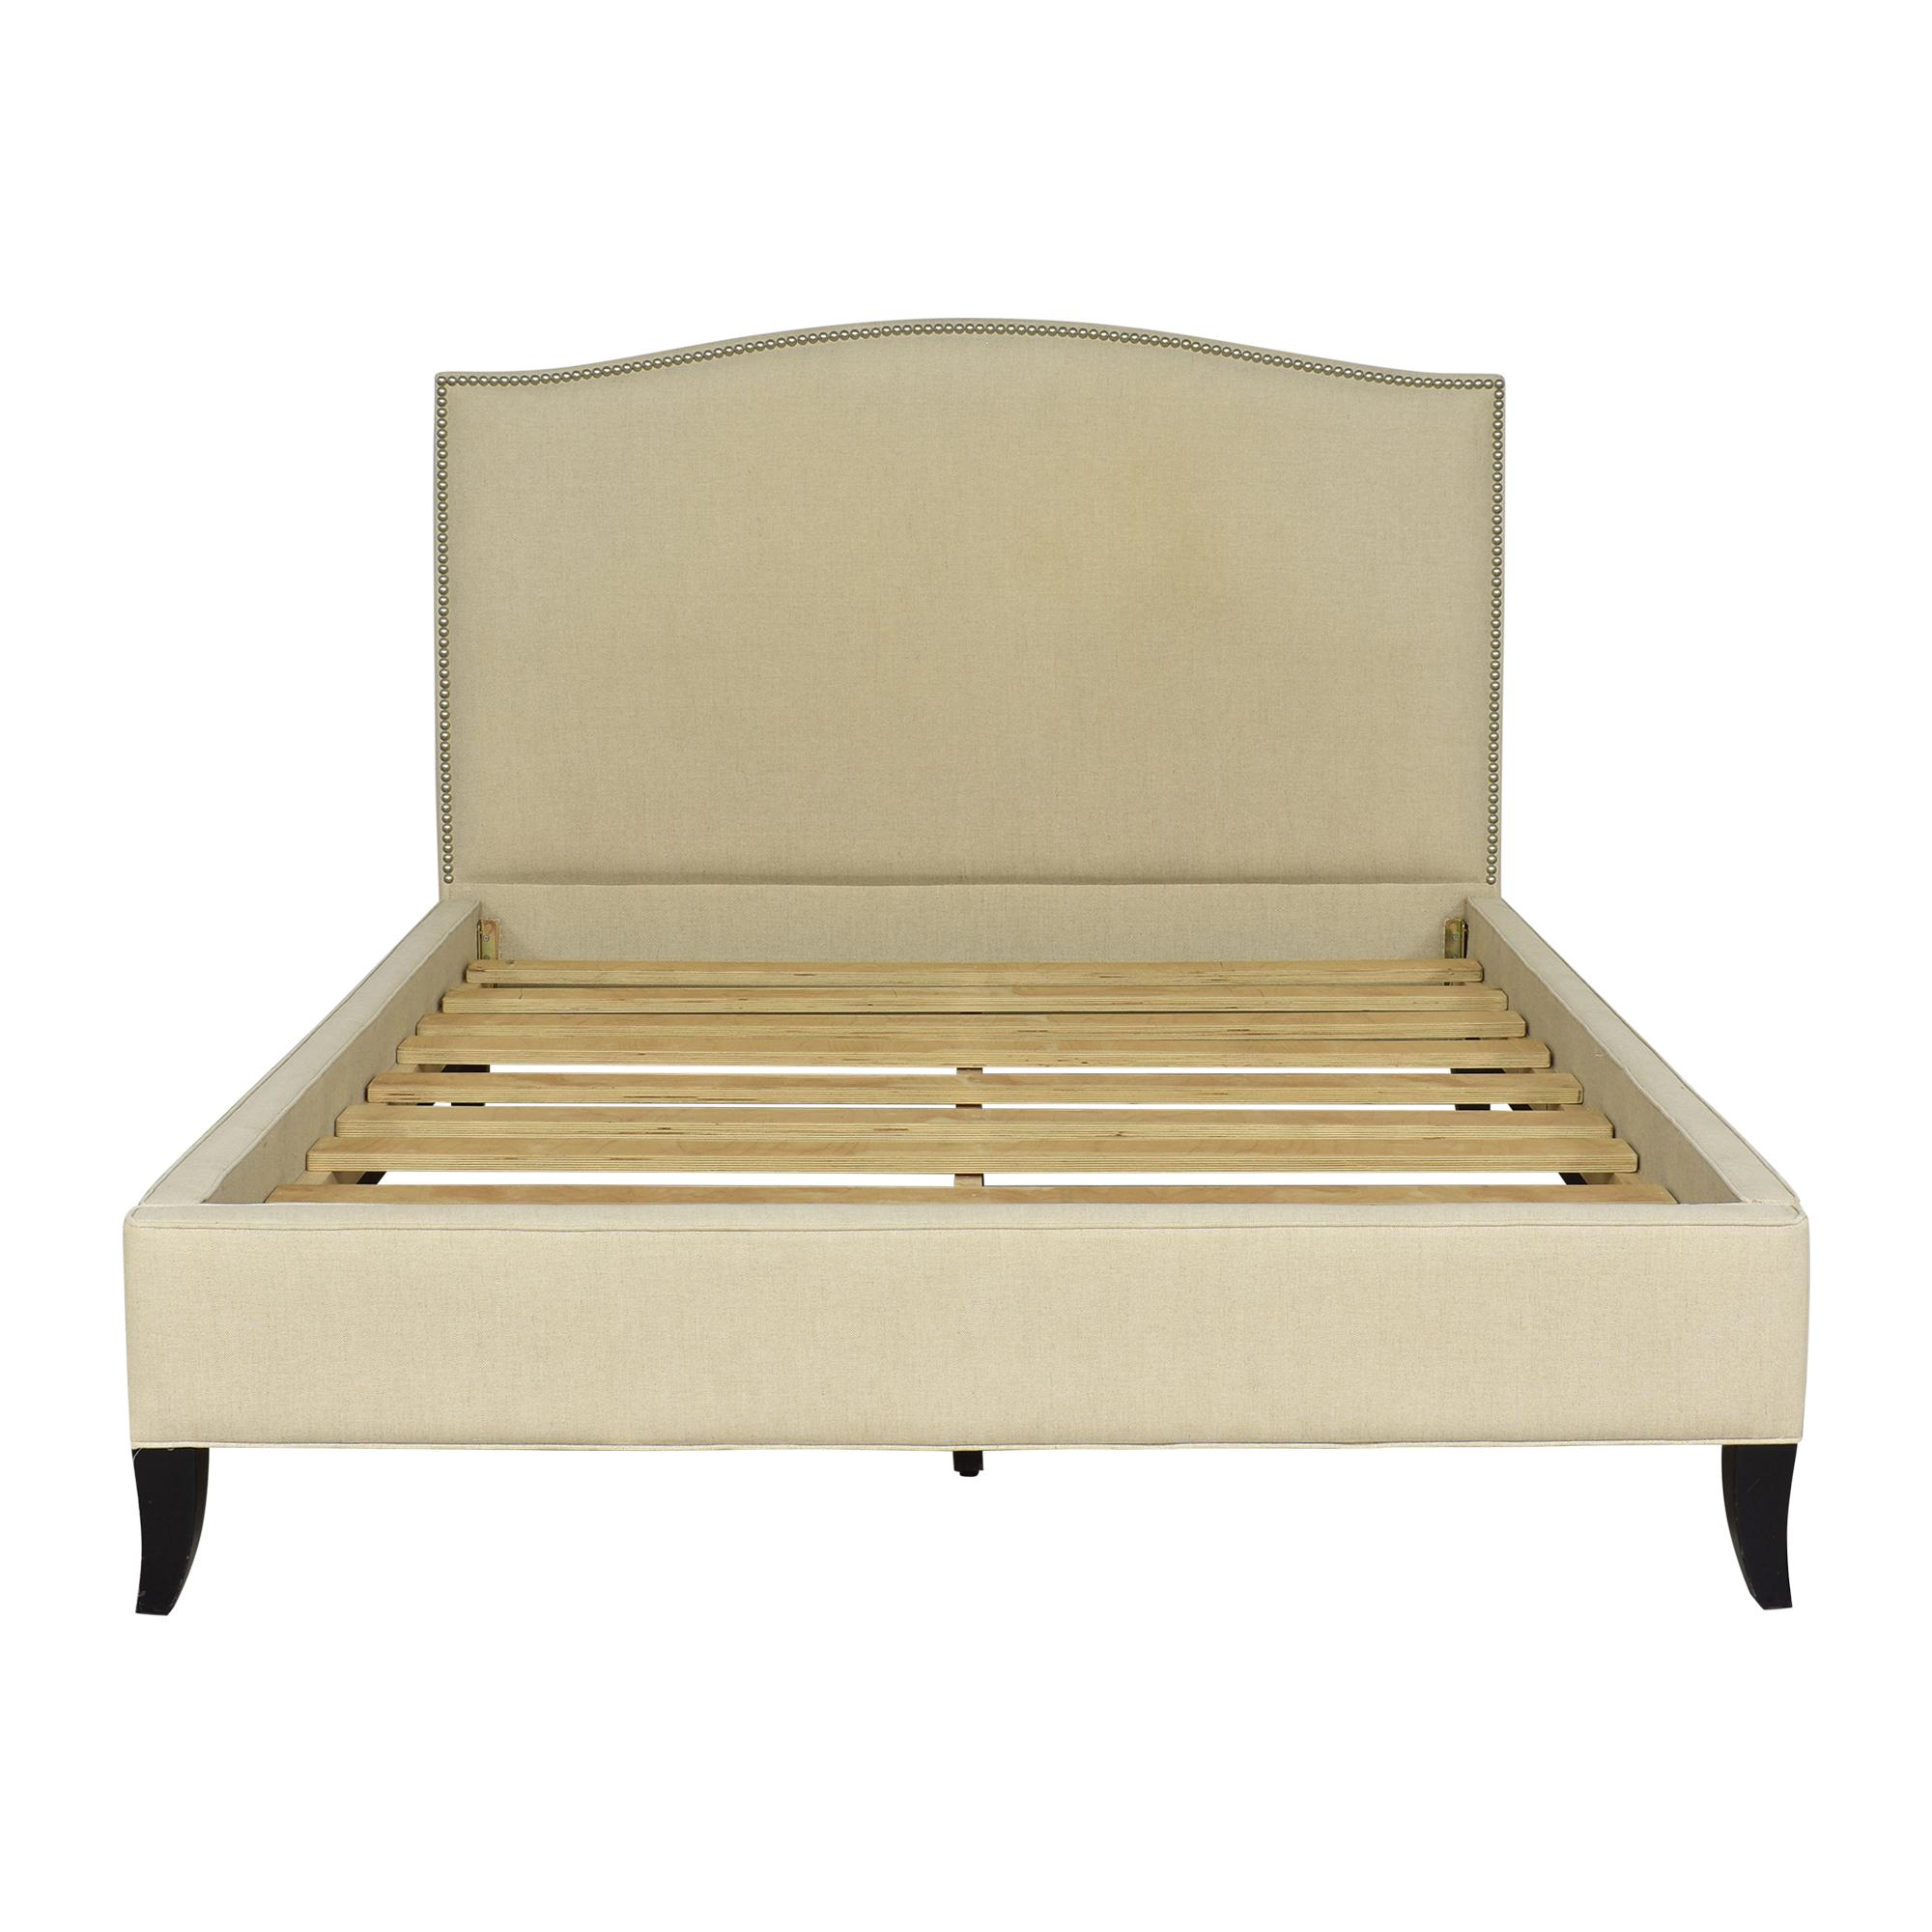 Crate & Barrel Crate & Barrel Colette Upholstered Queen Bed Beds